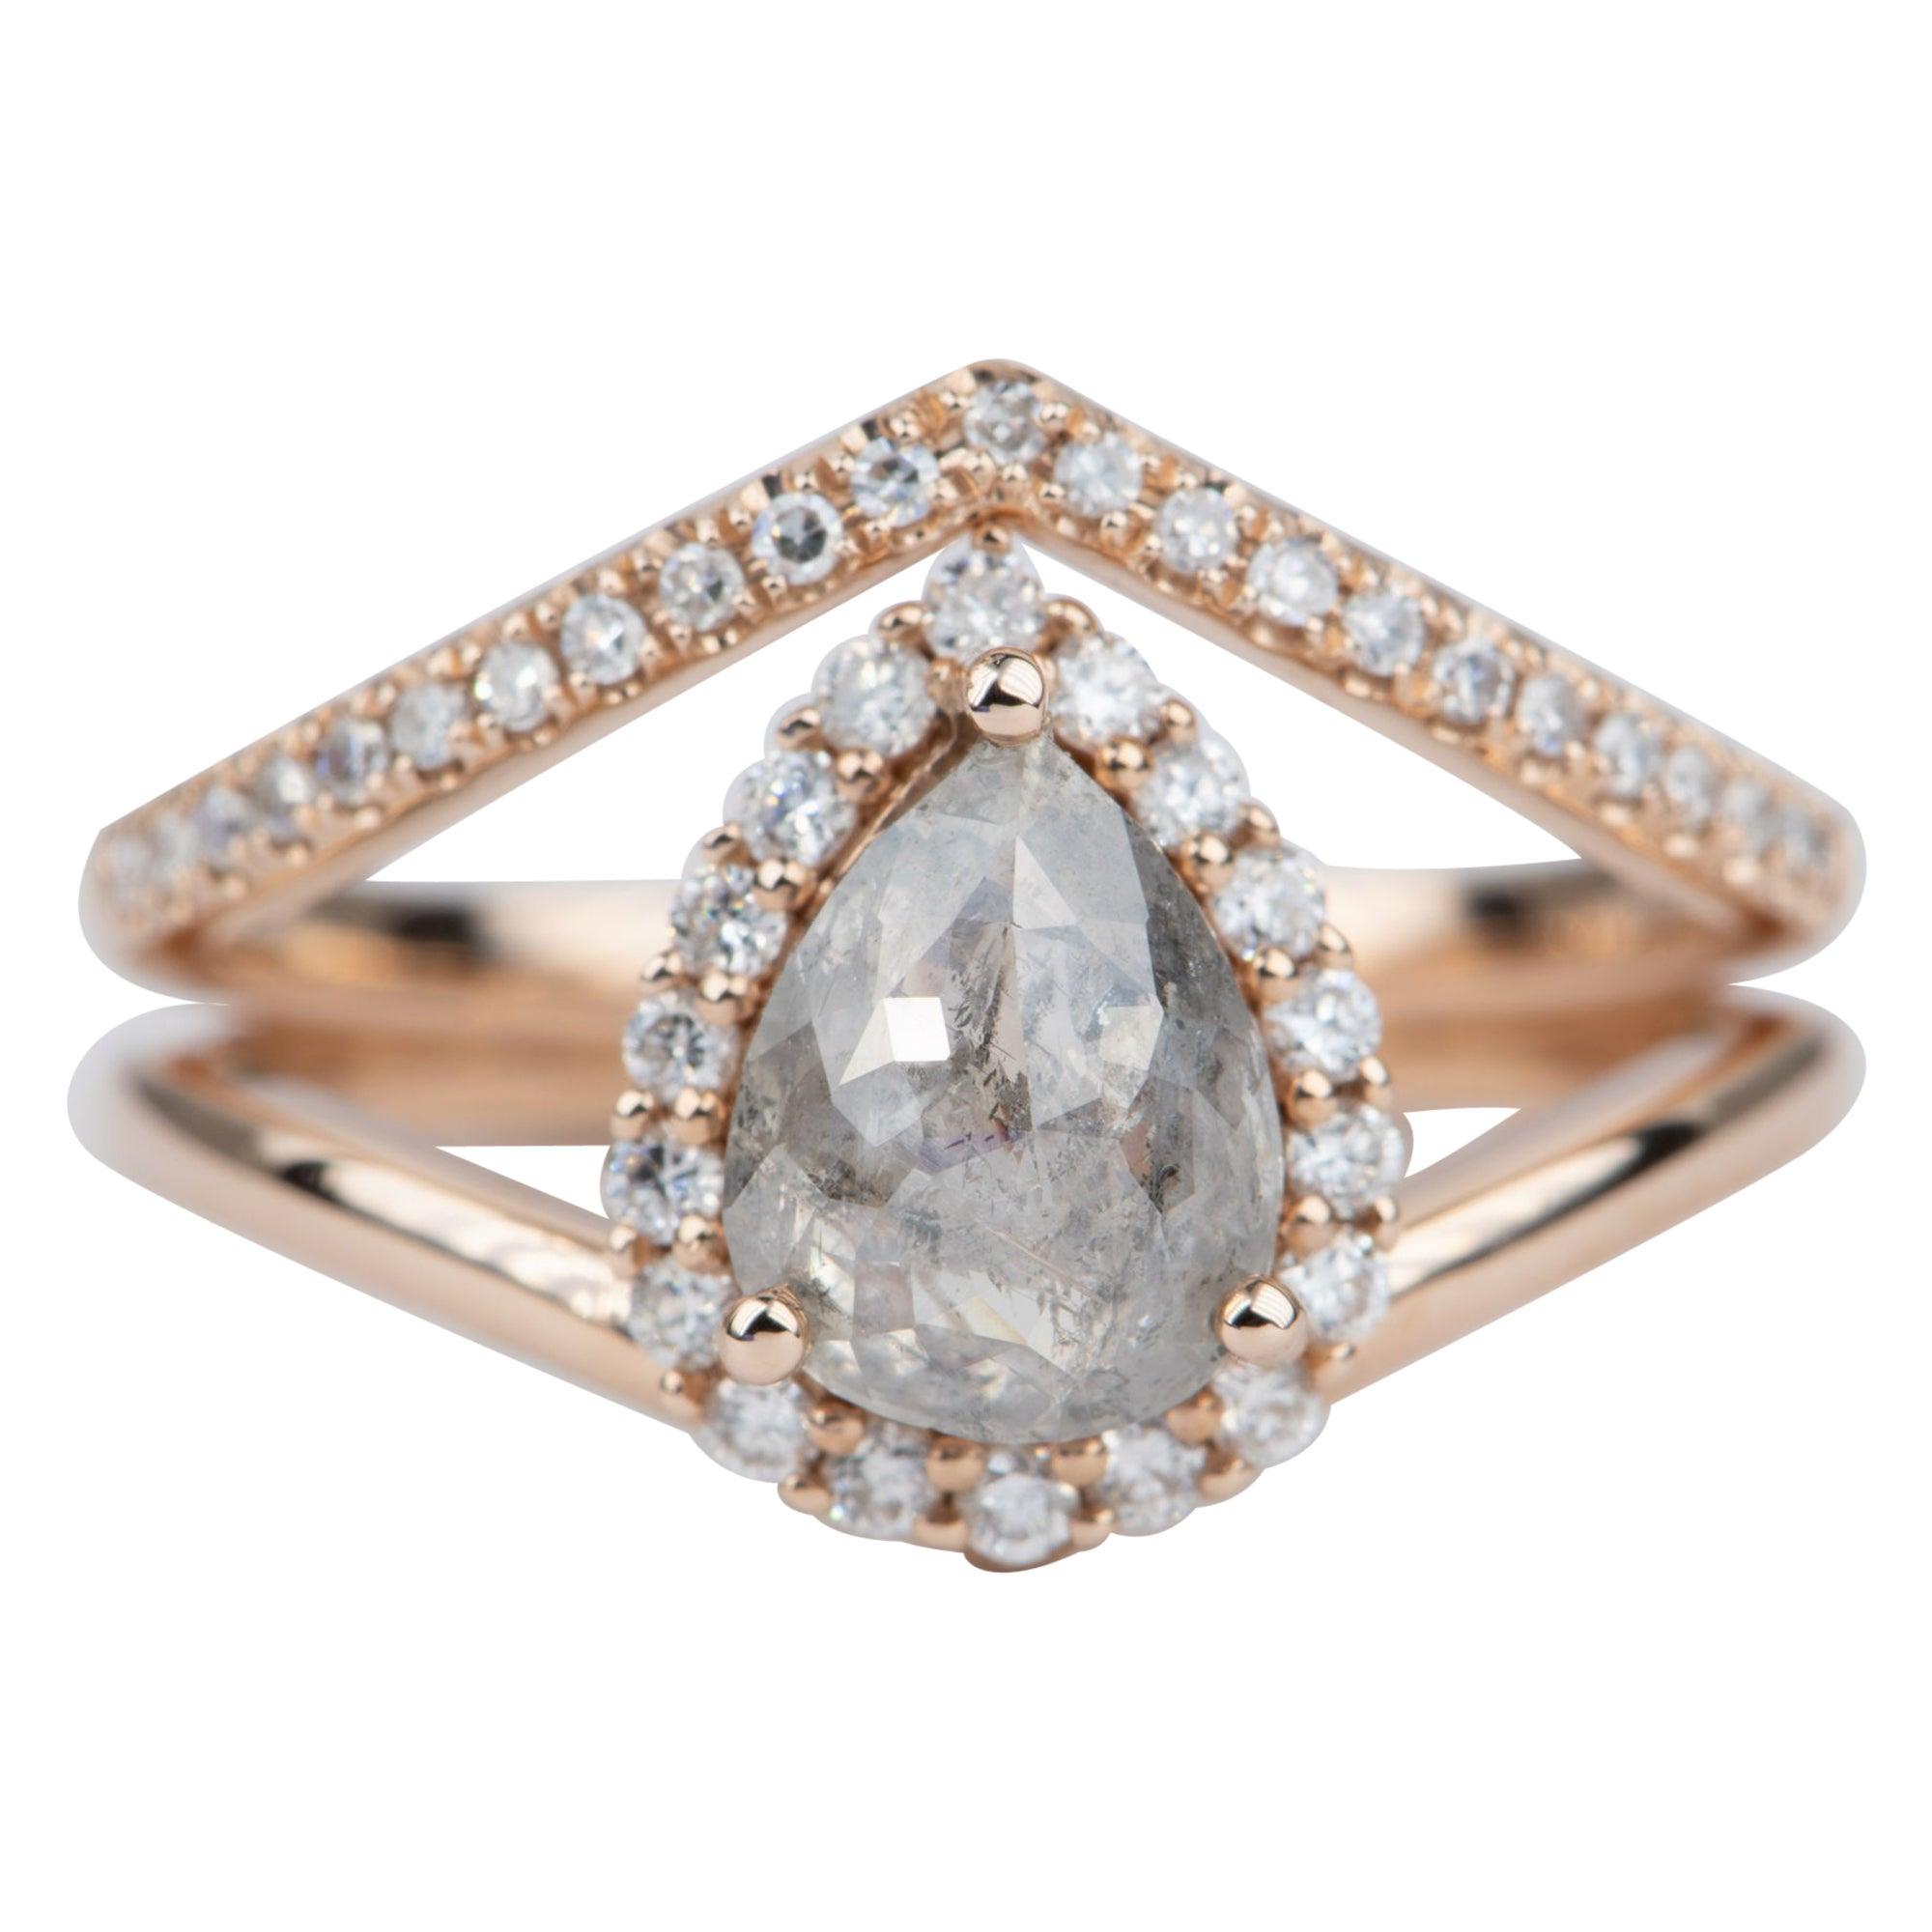 1.34 Carat Pear Shape Salt and Pepper Diamond 14 Karat Gold Ring Set AD2042